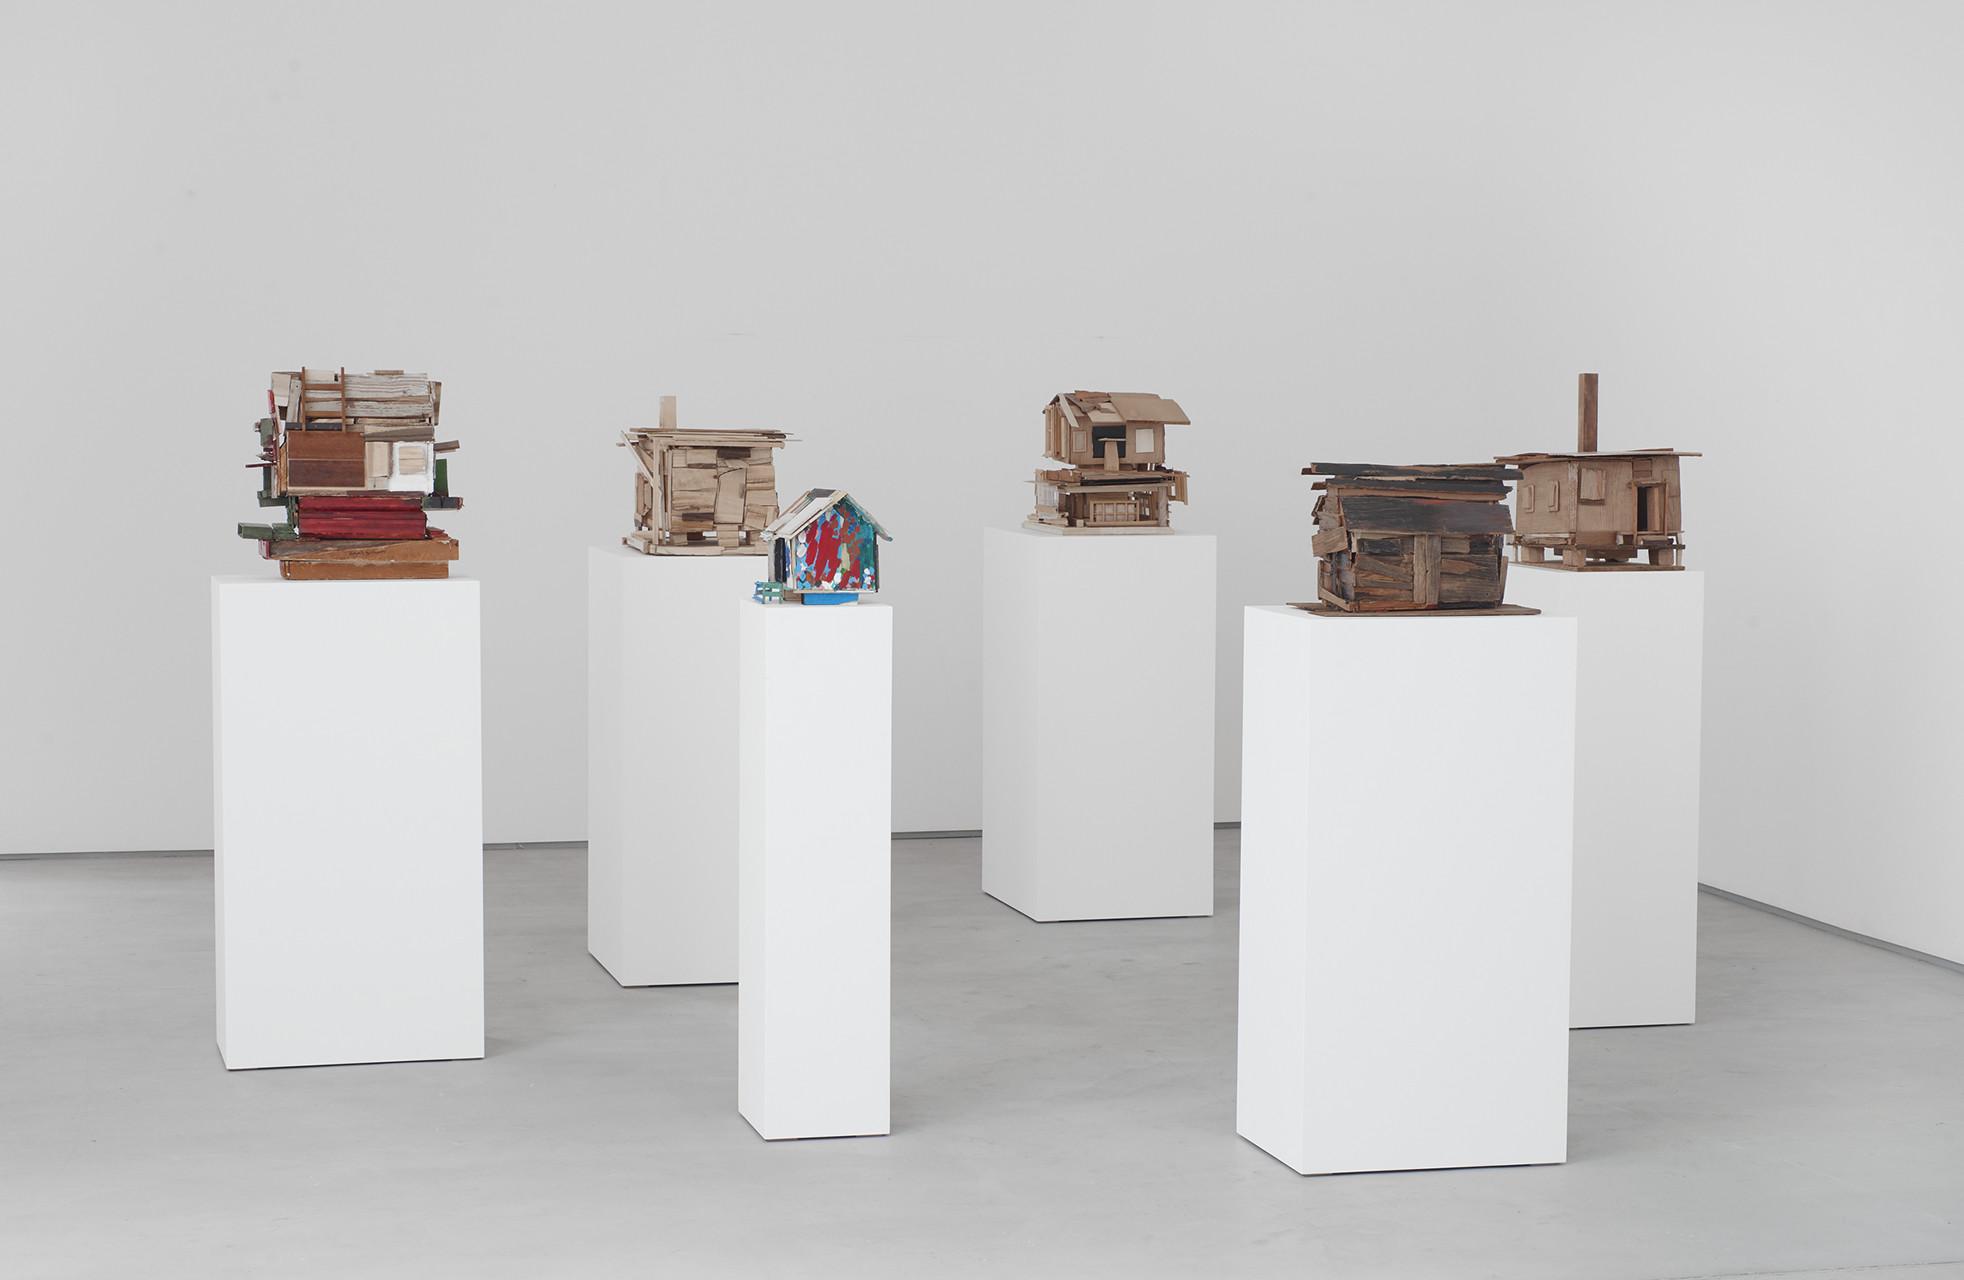 <p>Beverly Buchanan, installation view, 2017</p>